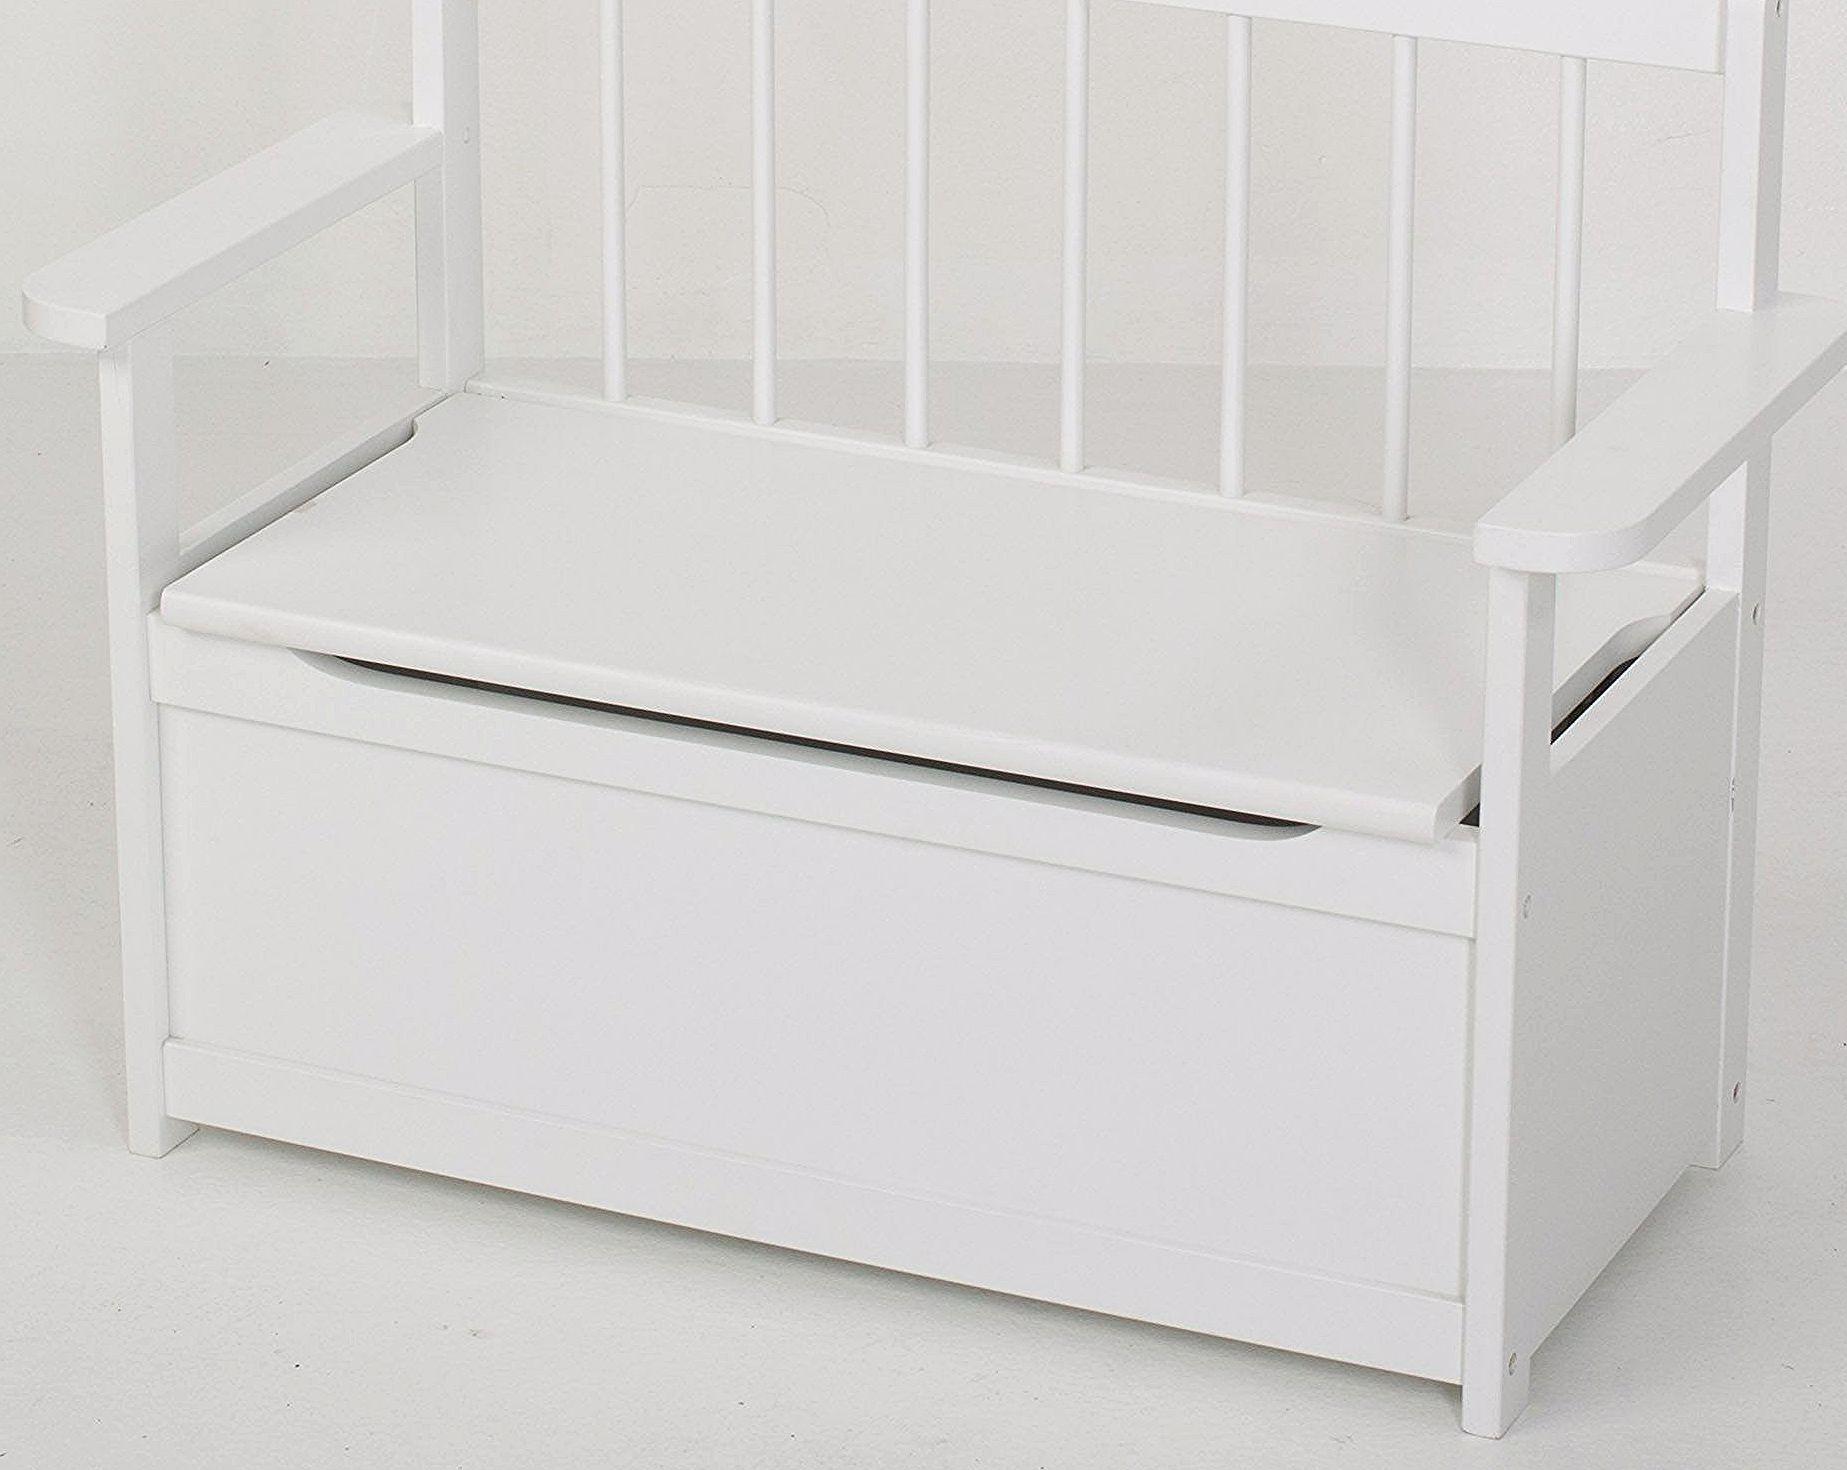 Meuble Rangement Enfant Ikea Stuva Chambre Enfant Rangement Chambre Enfant Meuble Rangement Enfant